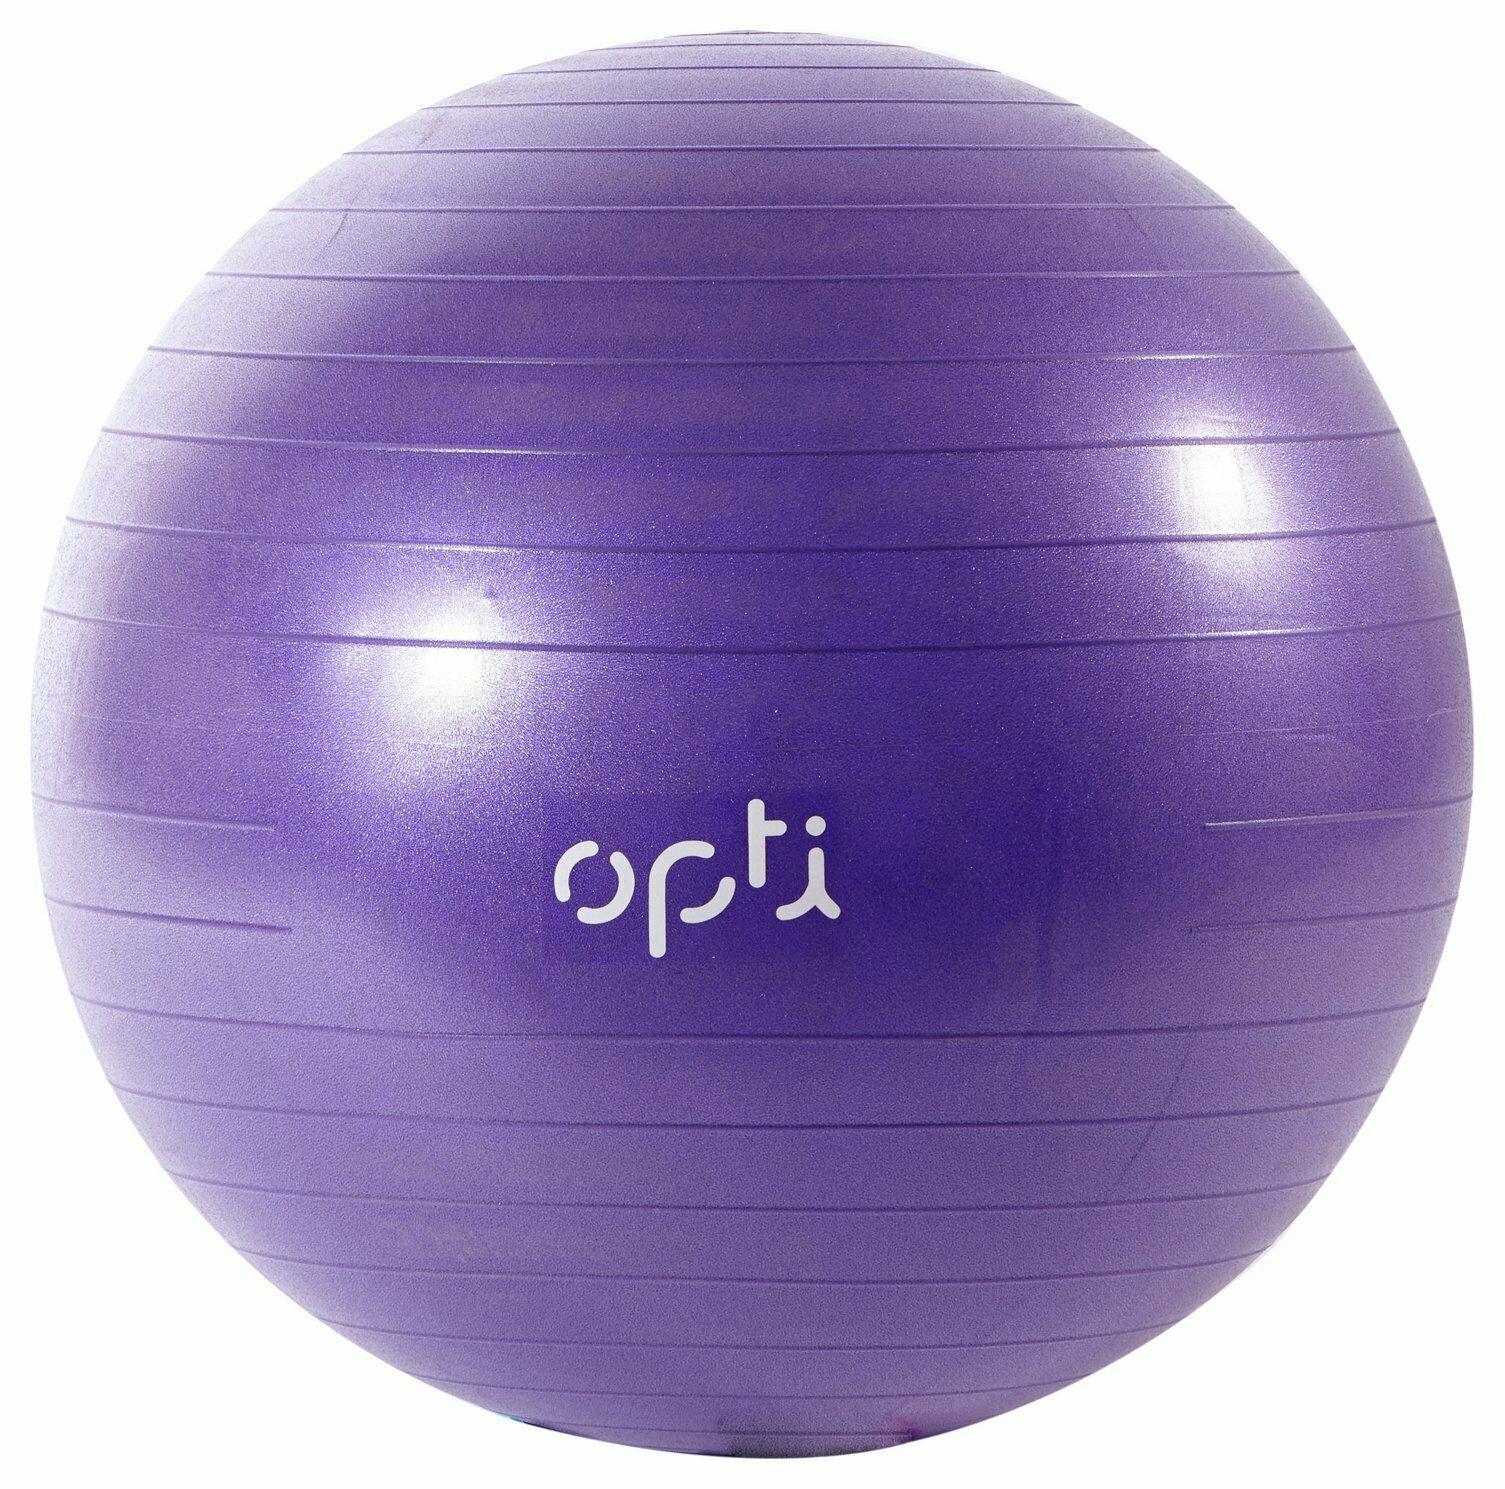 Opti Purple Gym Ball - 65cm - £7.19 (+£3.95 delivery) @ Argos